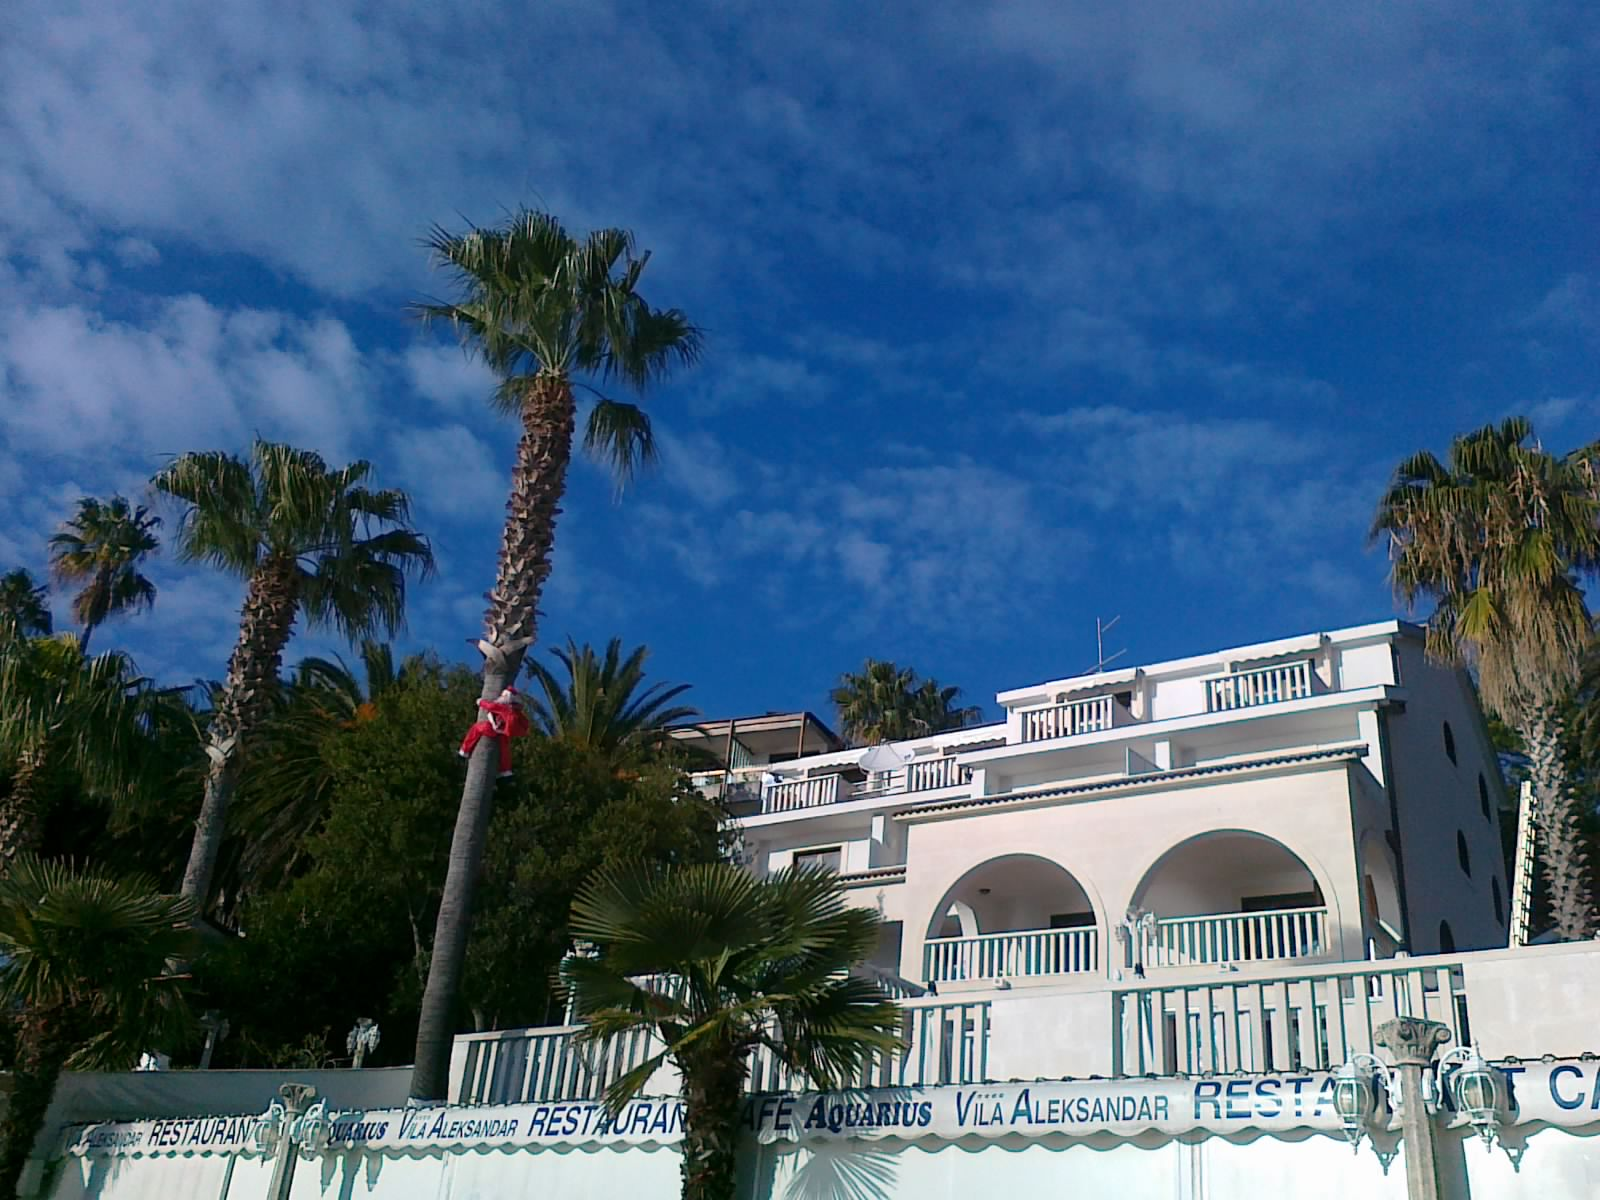 Villa Aleksandar Hotel Herceg Novi